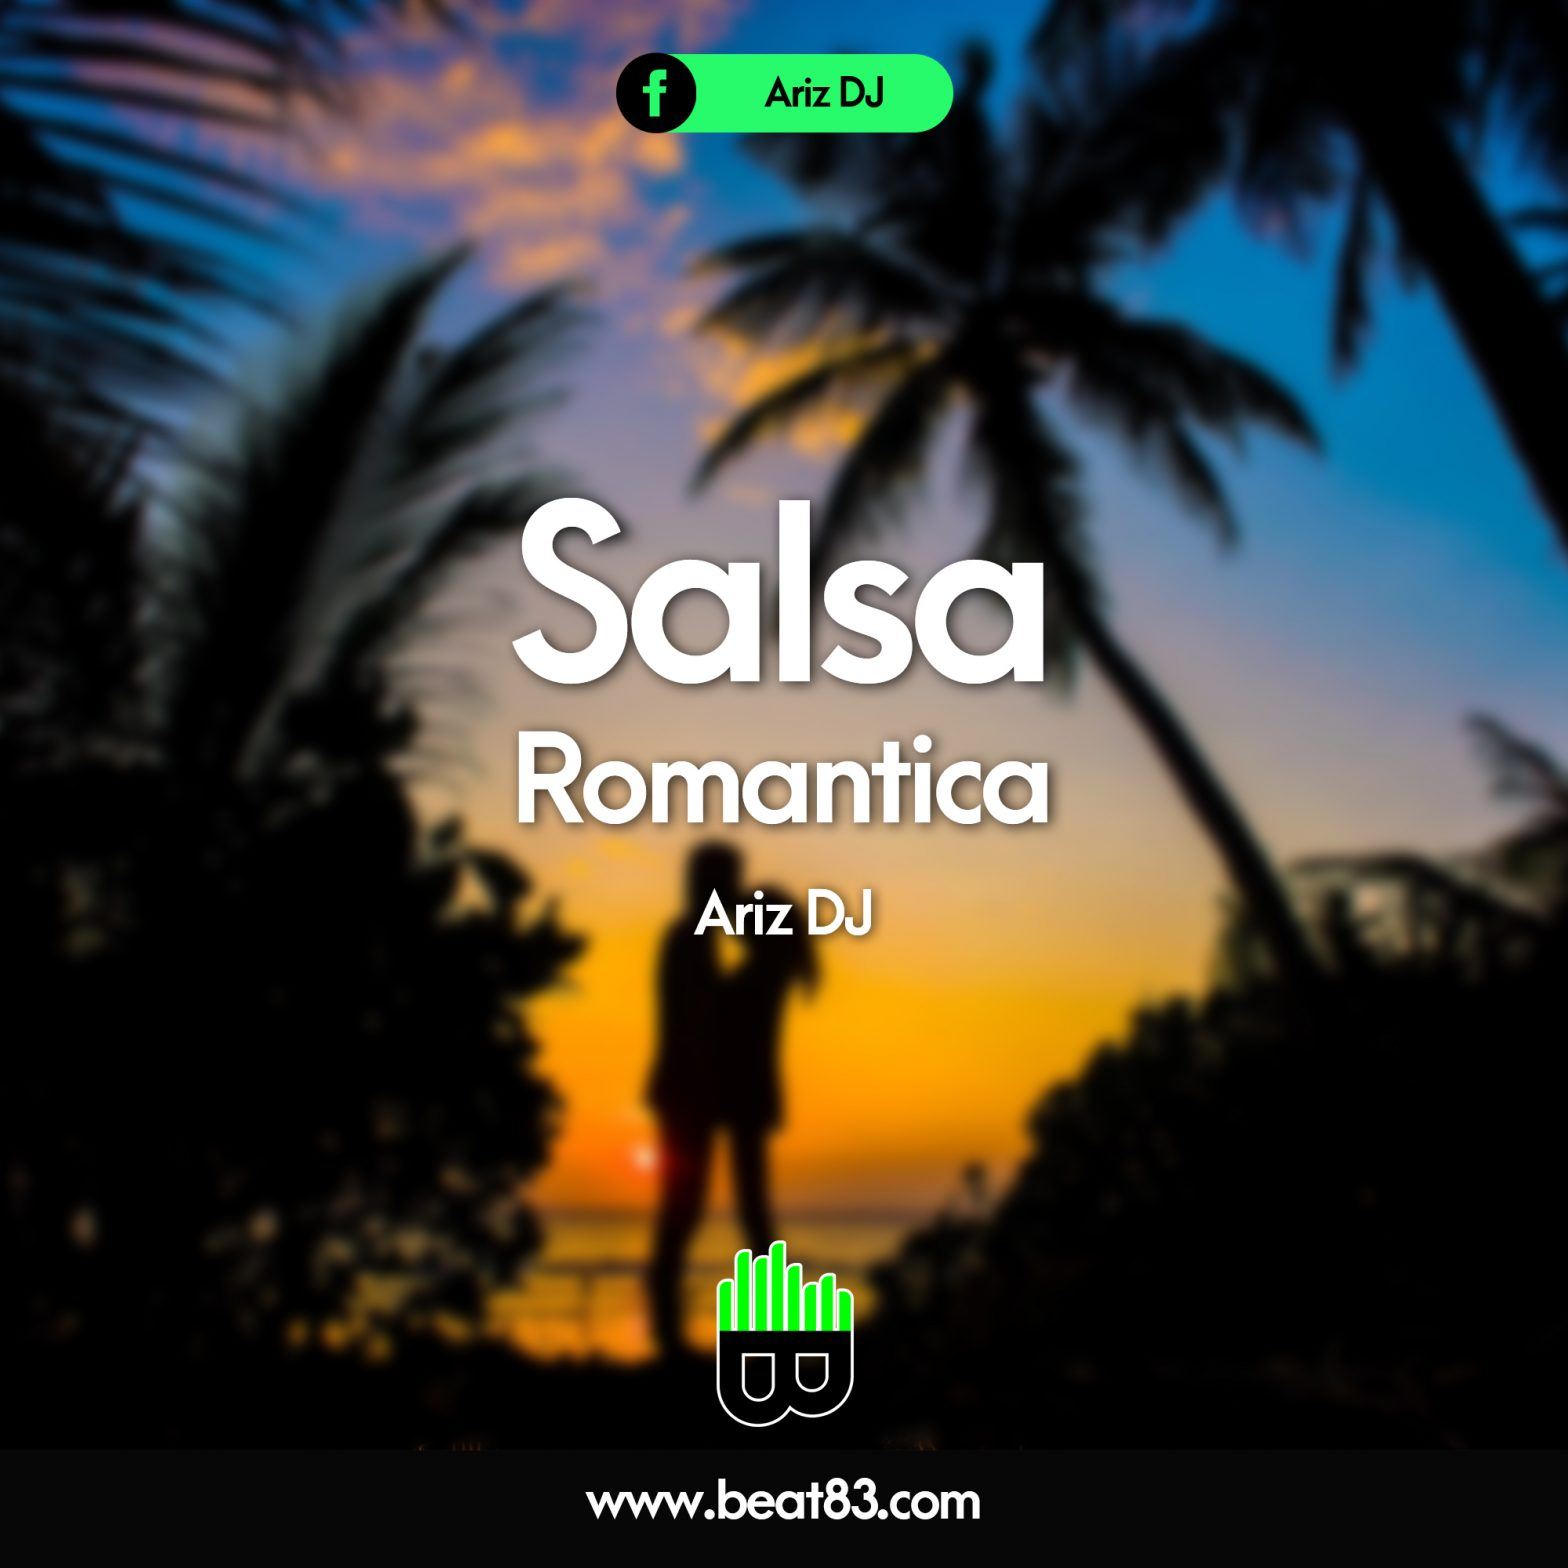 salsa romantica cover art